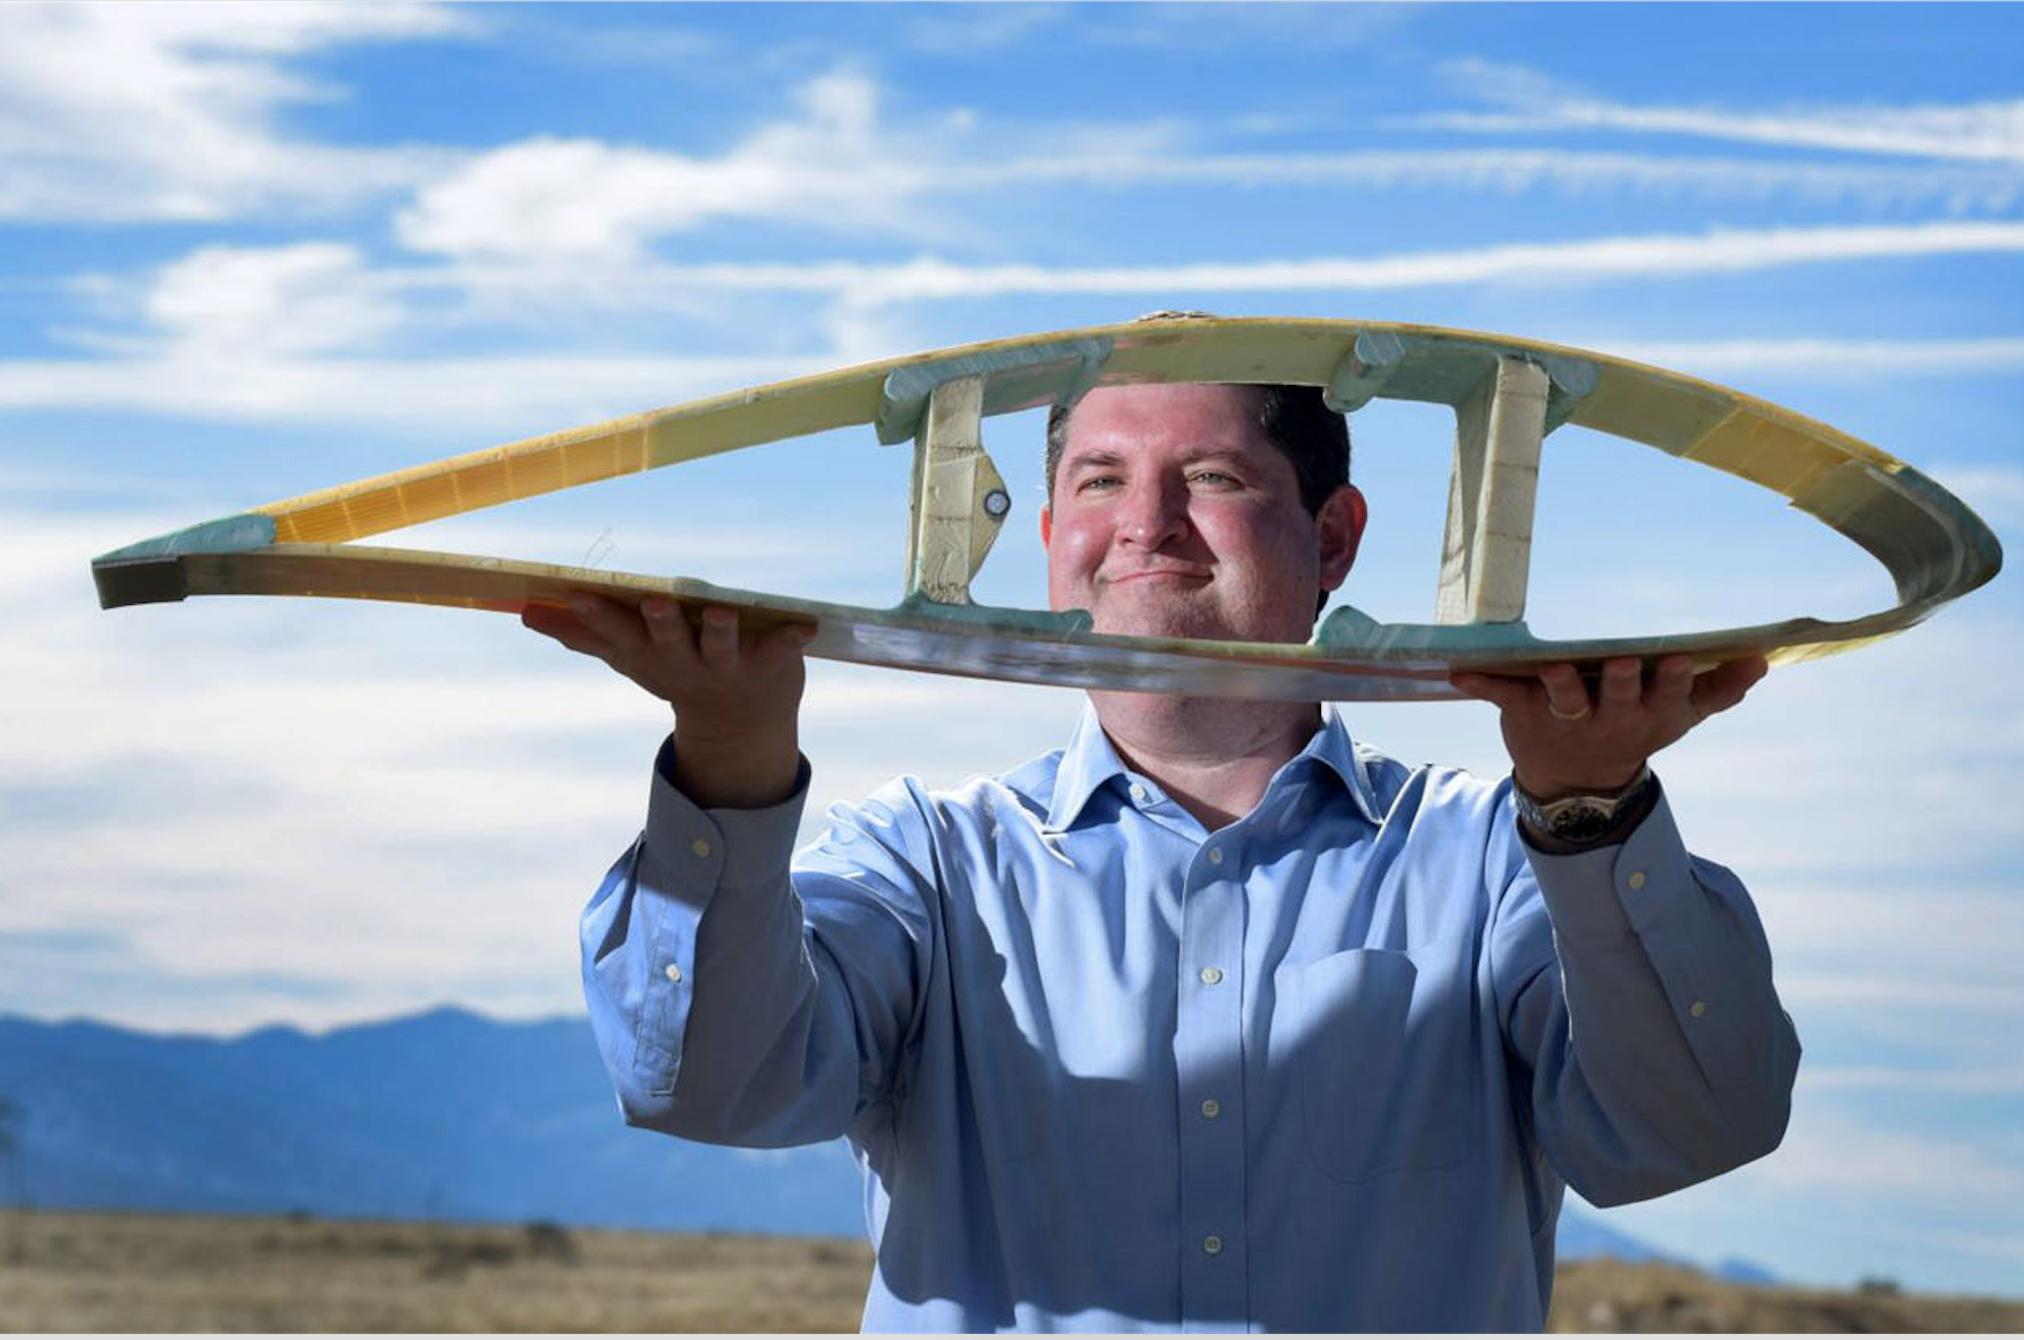 Sandia wants to make giant wind turbines twice the size of football fields